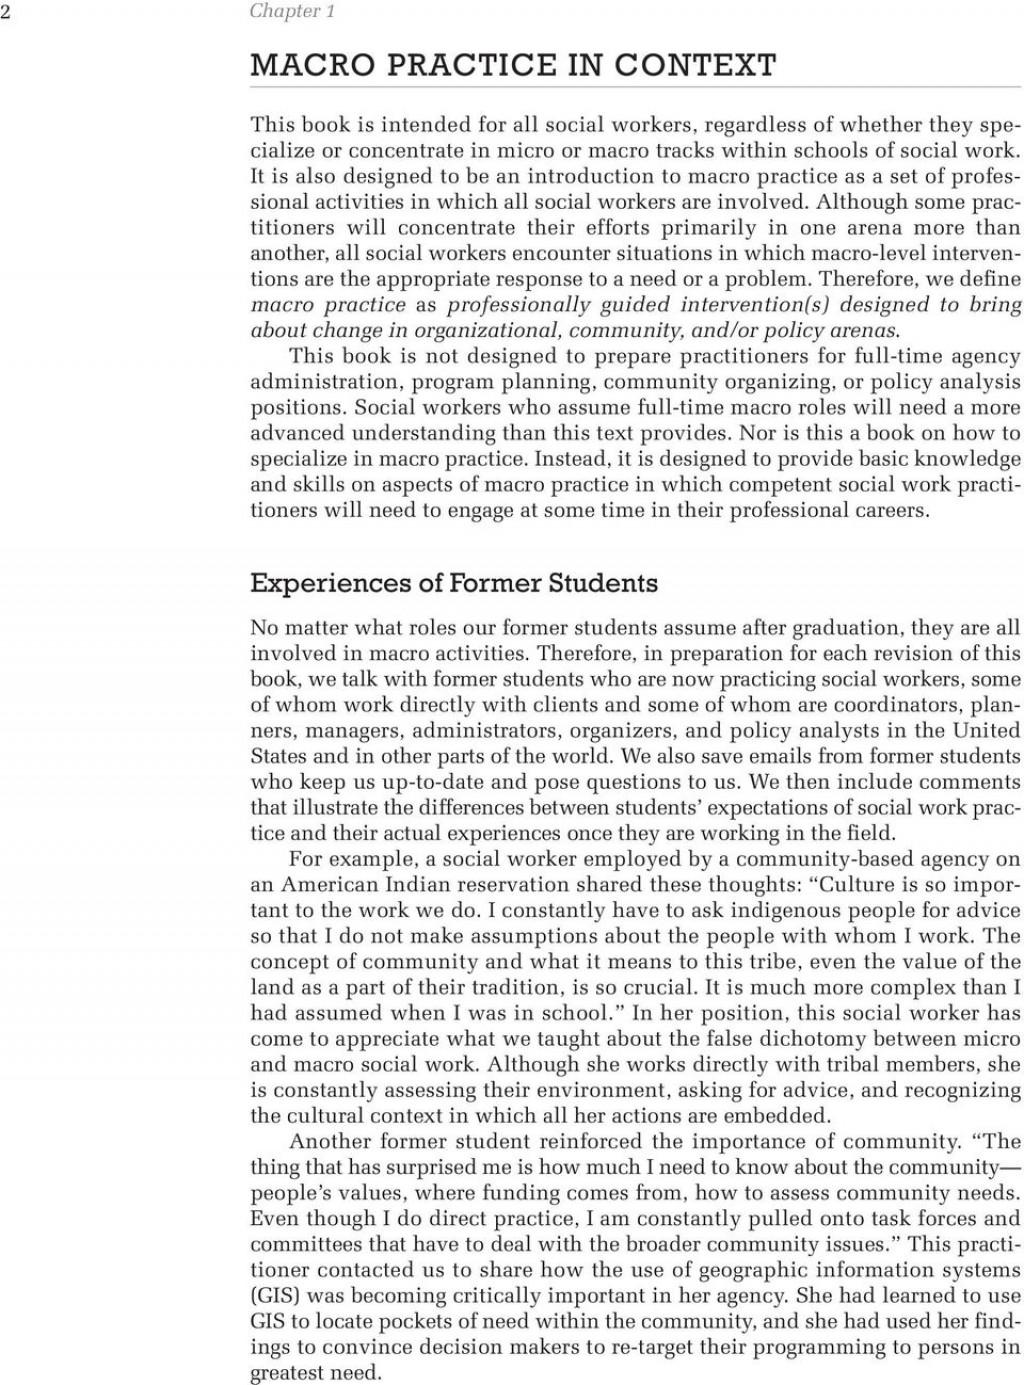 004 Work Ethics Essay Medical School Application Med App Essays P Sample Prompt Tips Help Formidable Example Code Of Outline Large